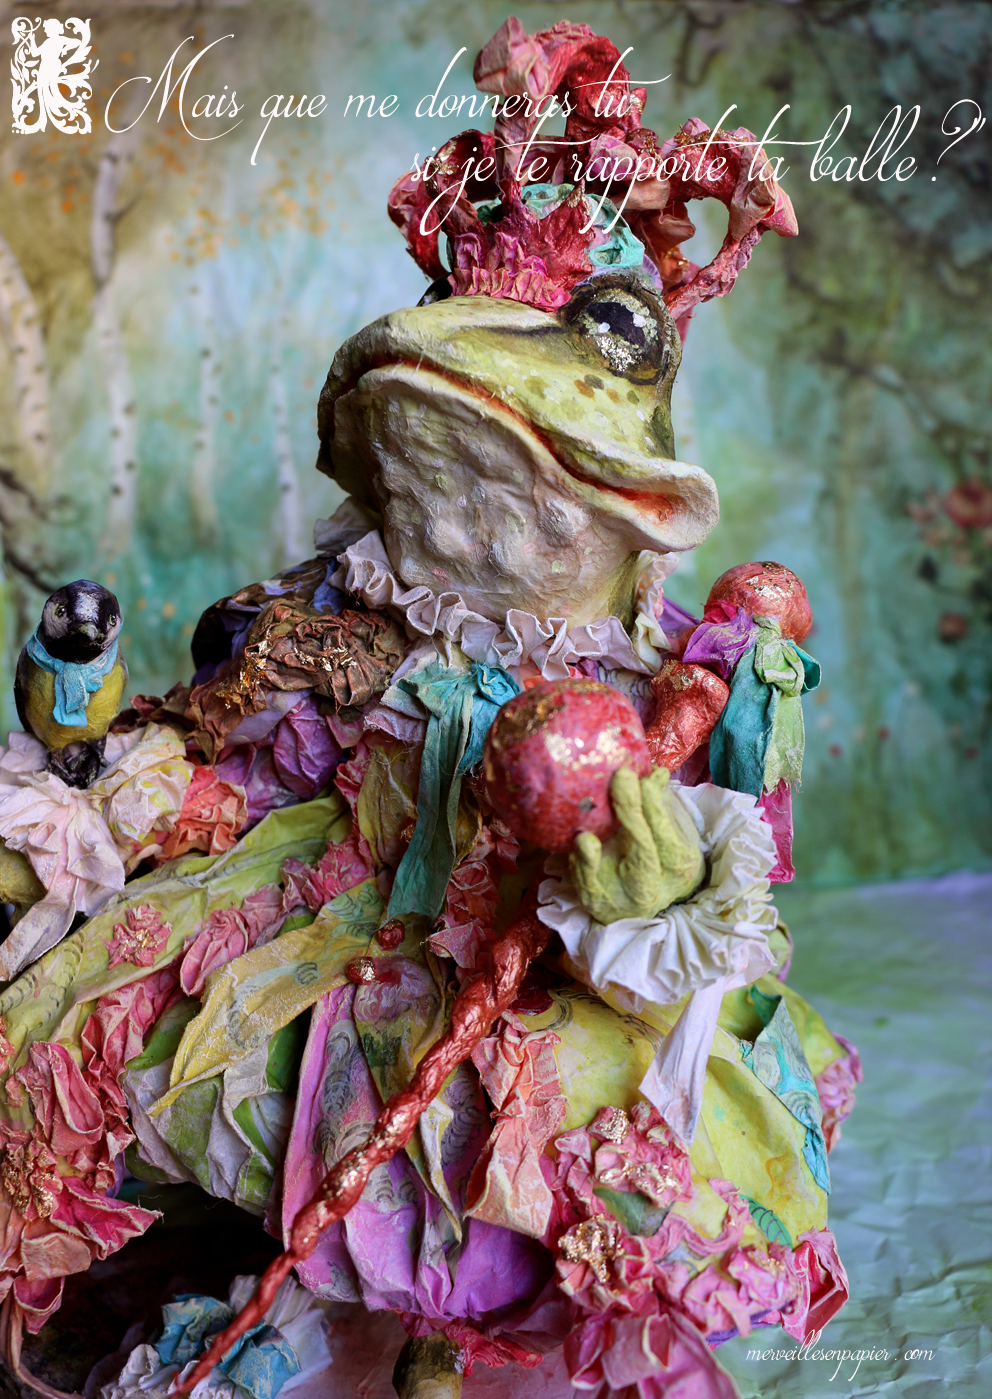 prince-grenouille-95.jpg